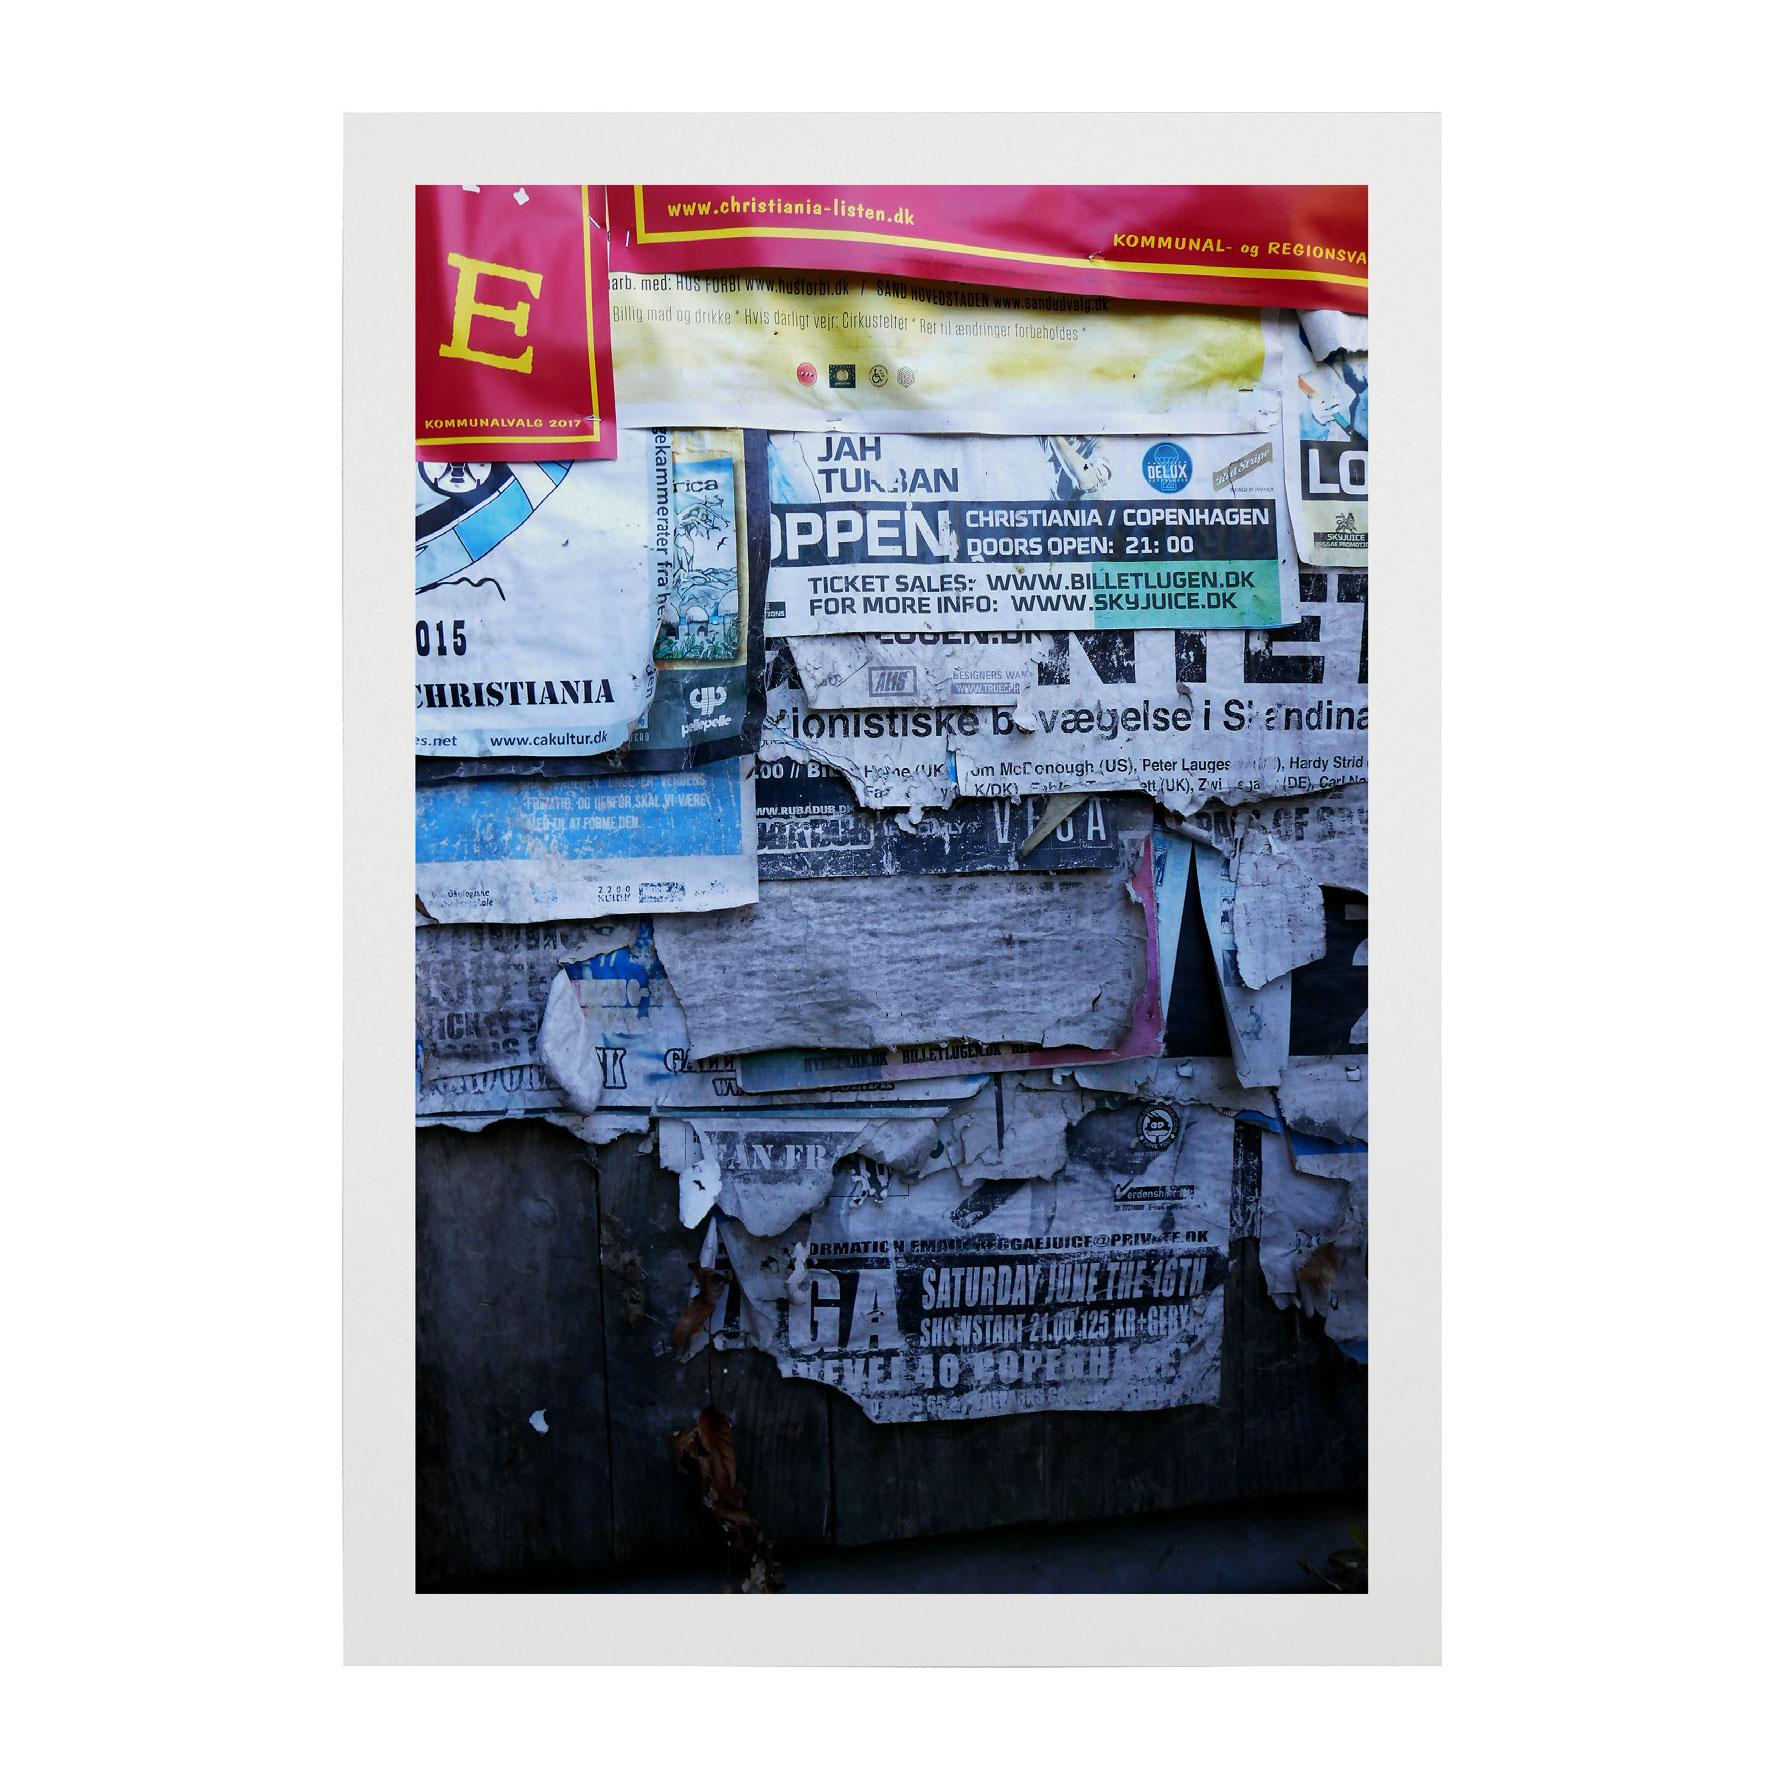 EXTRA-WEB-PICS-8